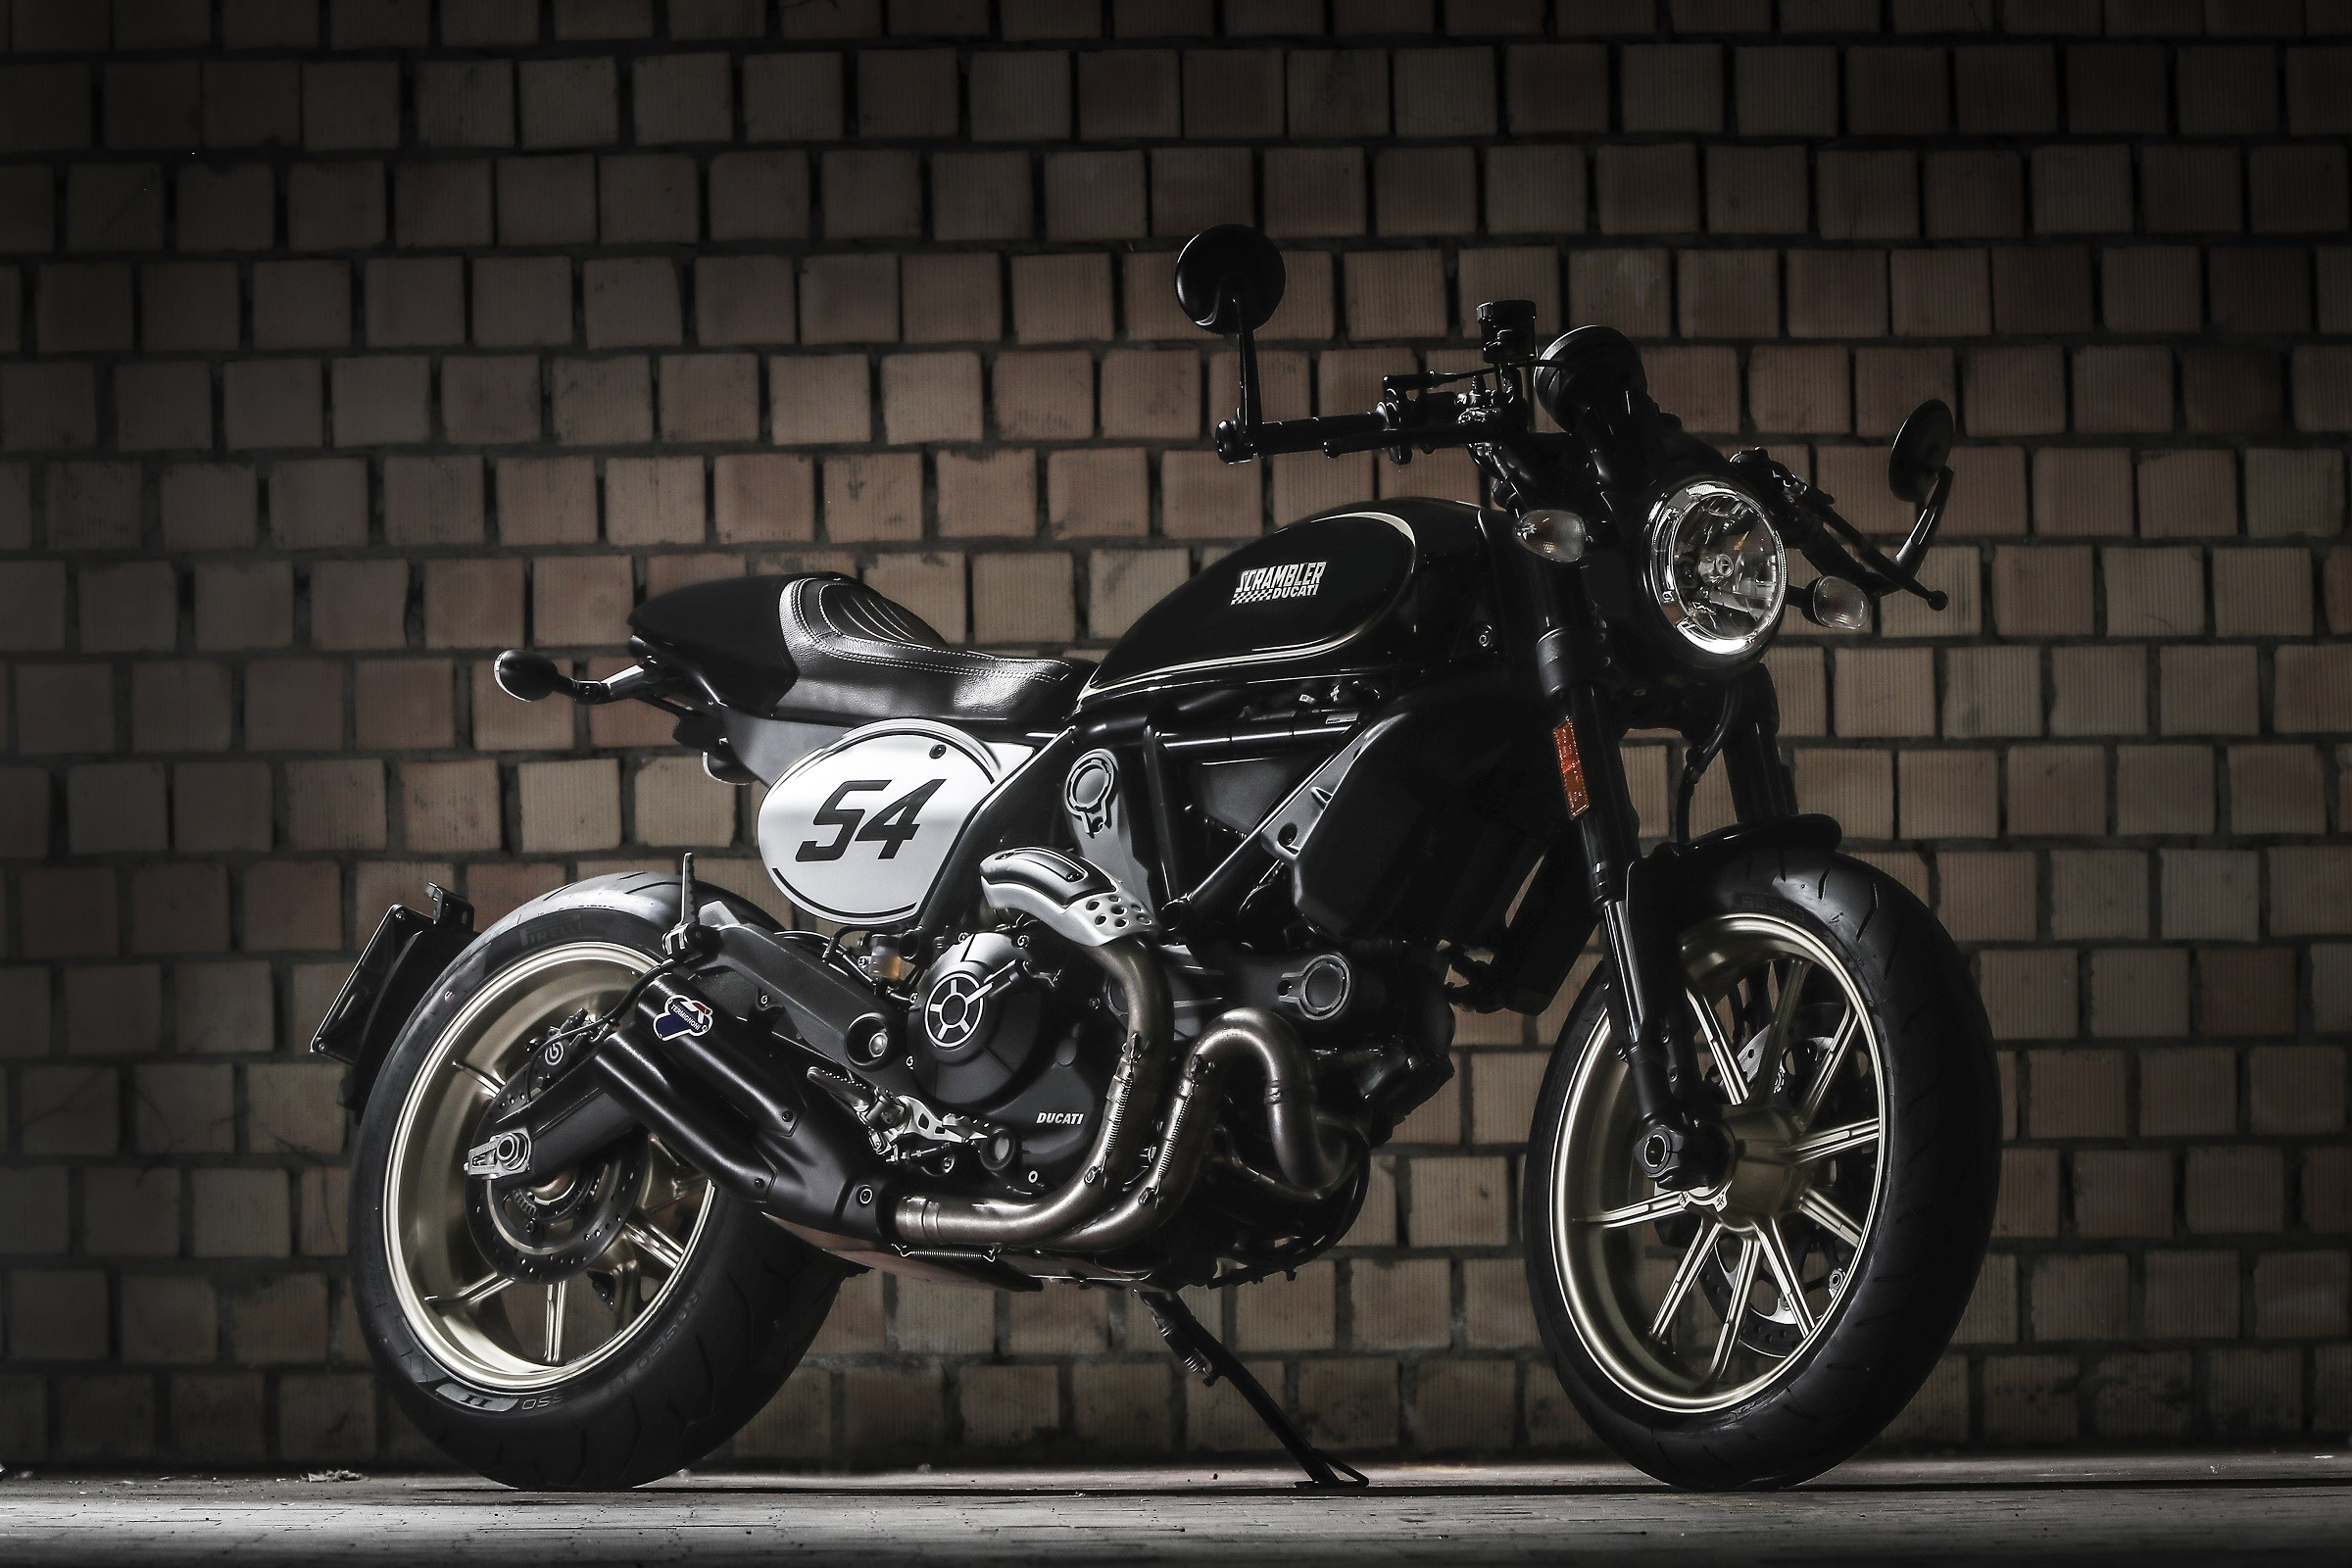 ducati scrambler bike background wallpaper 65285